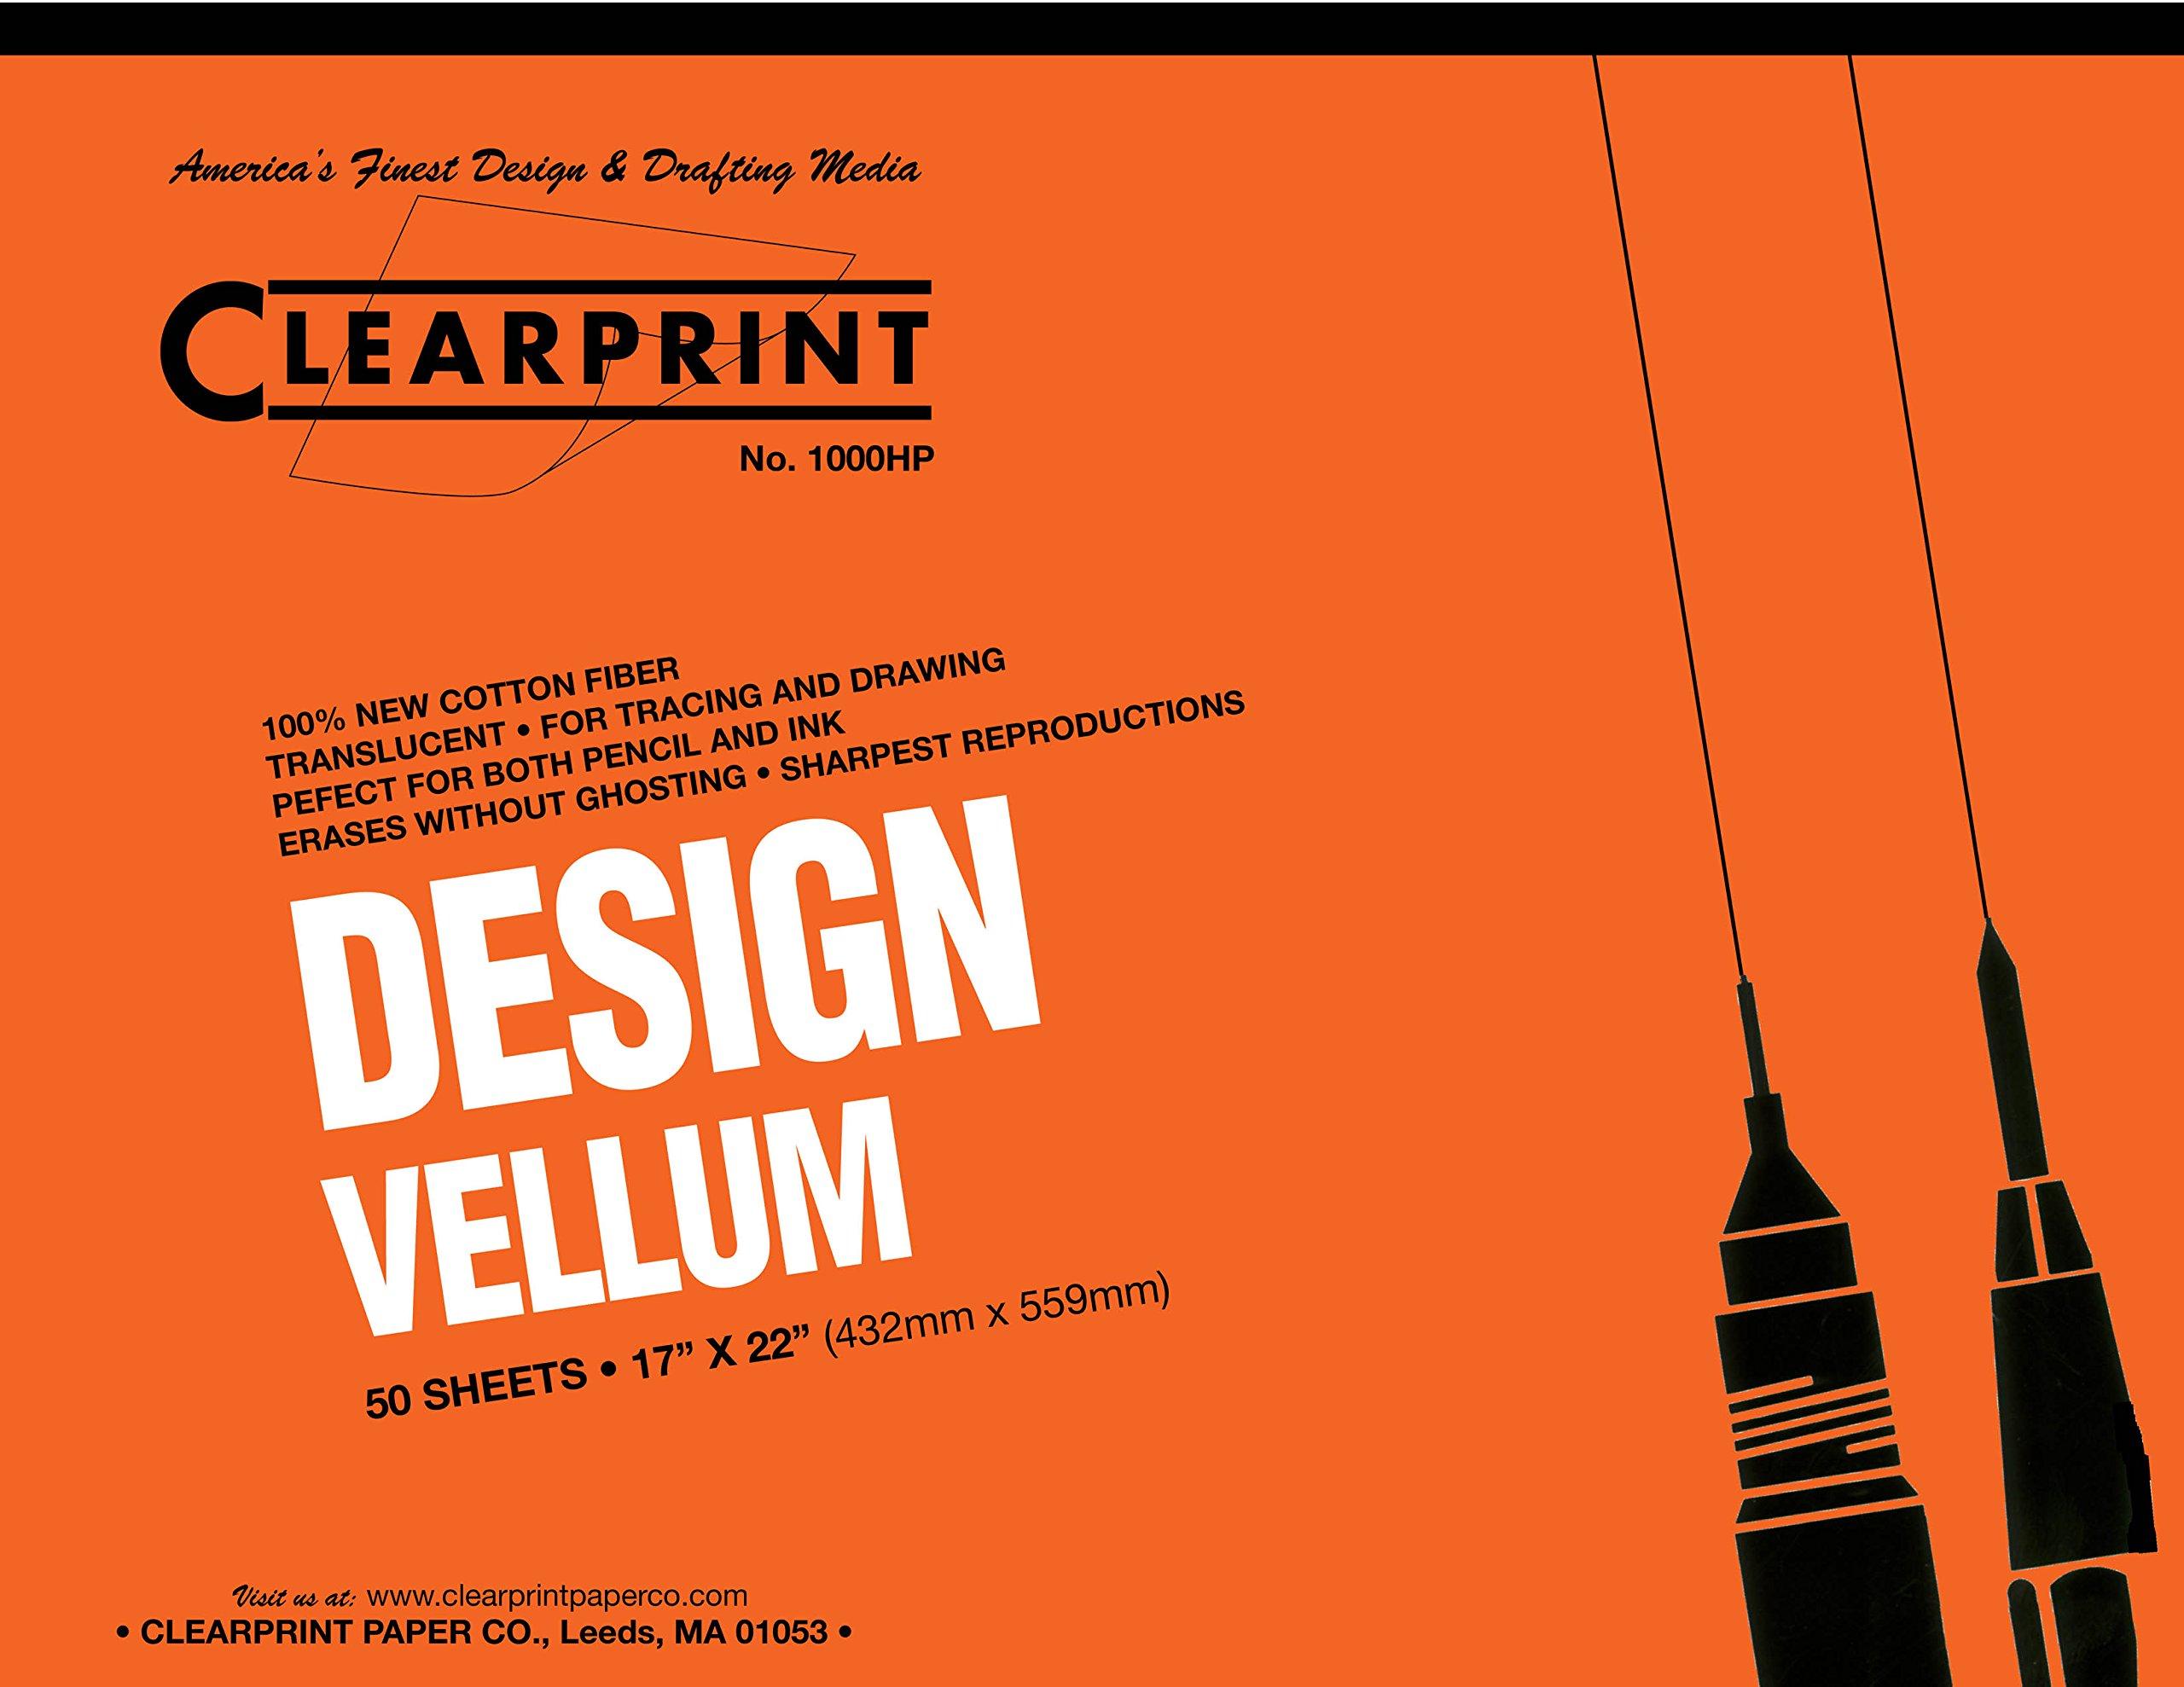 Clearprint 1000H Design Vellum Pad, 16 lb., 100% Cotton, 17 x 22 Inches, 50 Sheets, Translucent White, 1 Each (10001420)